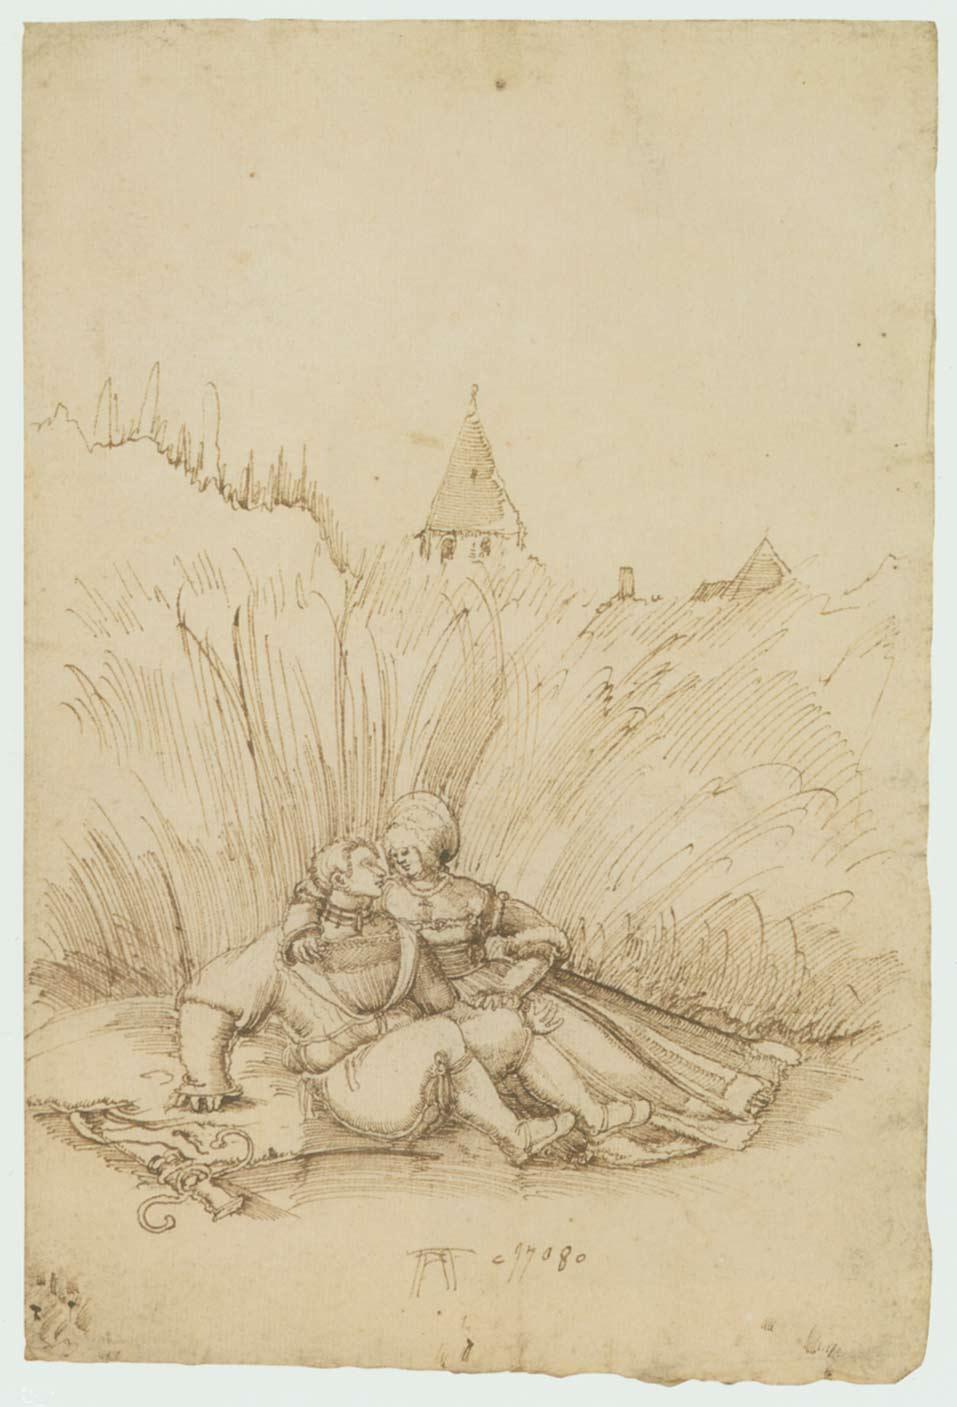 Lovers in a Hay Field - Albrecht Altdorfer